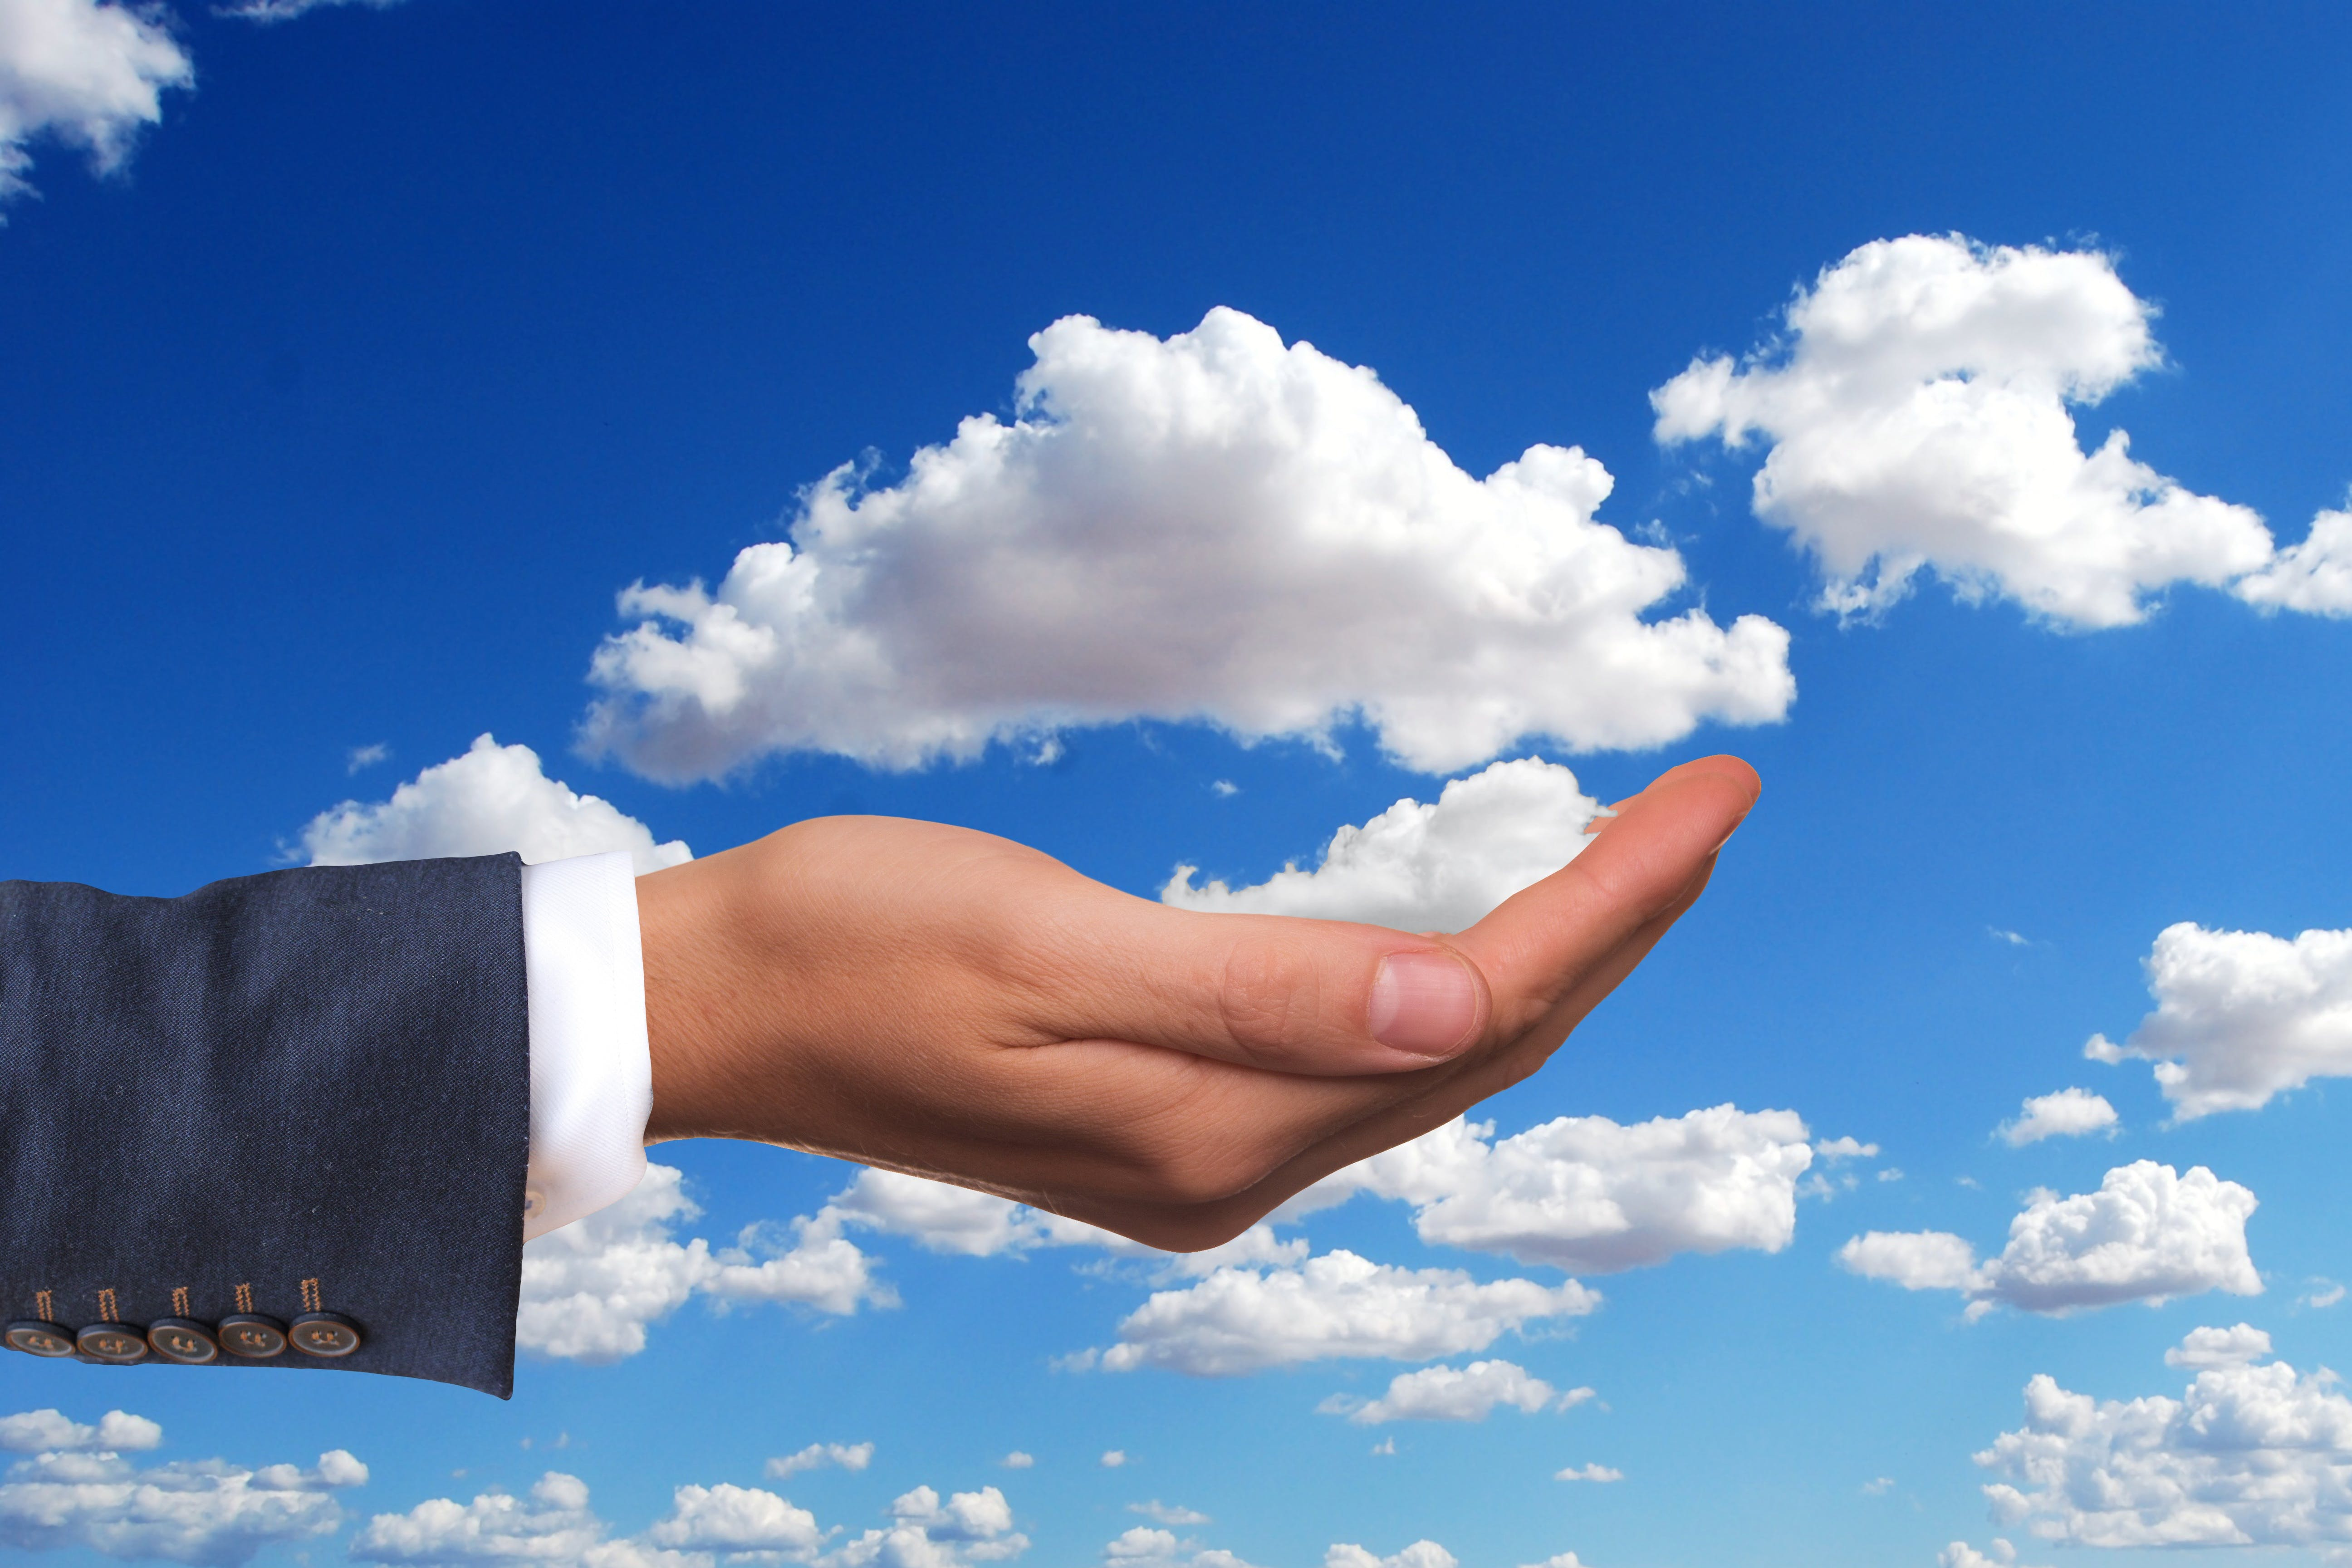 Titelbild-Cloud-Hand-auf-Mann-Business-3599920-pixabay-geralt